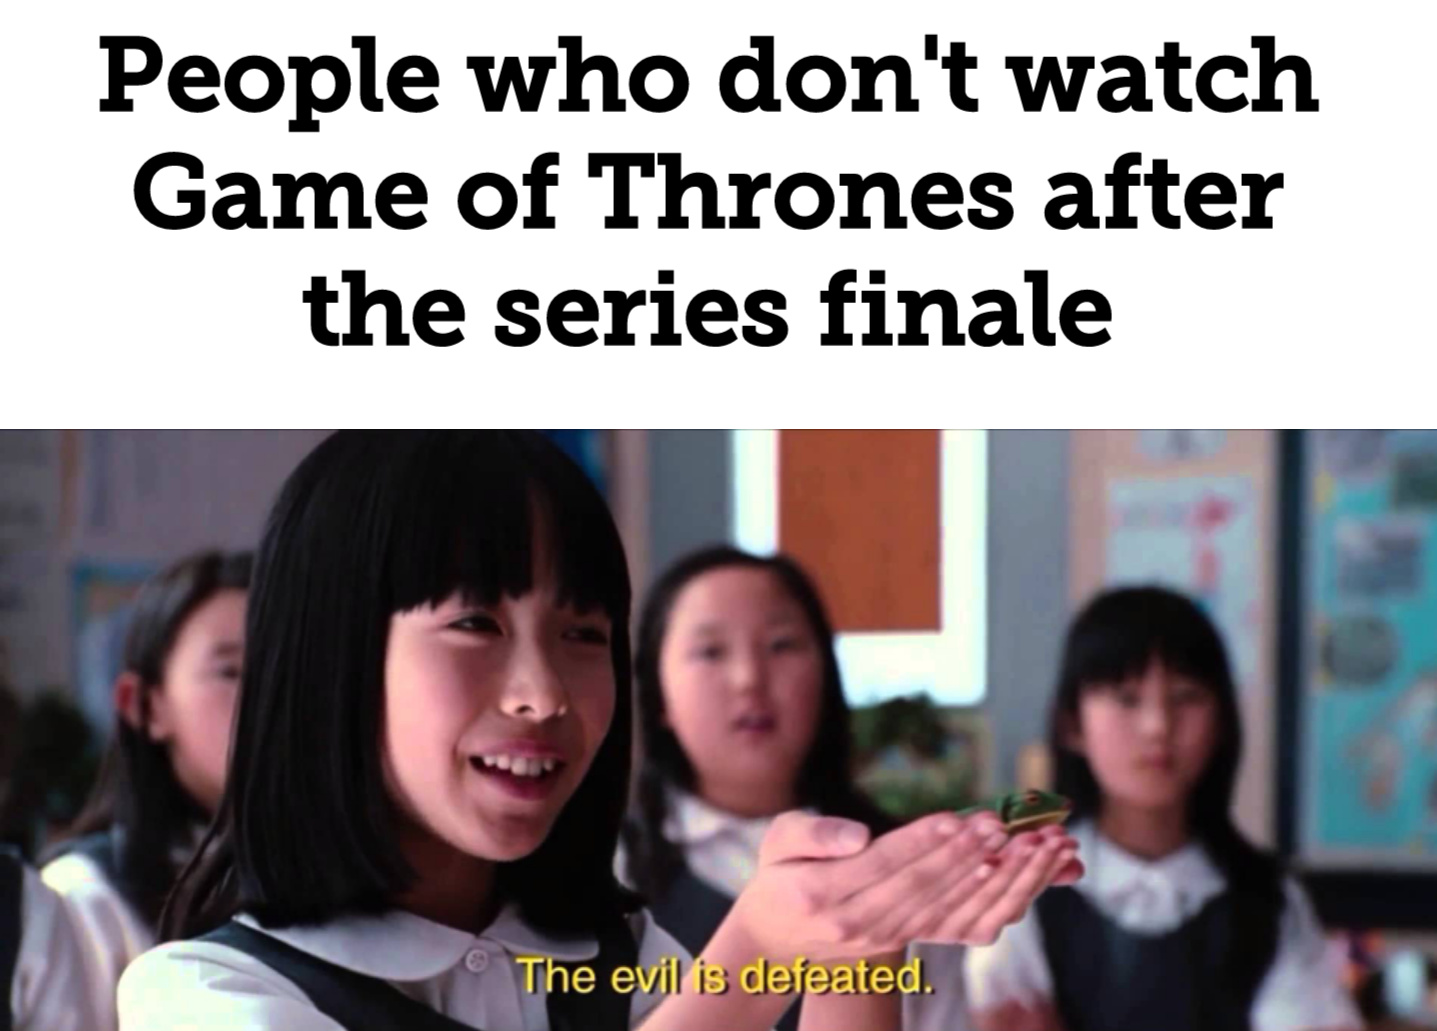 It's finally over - meme